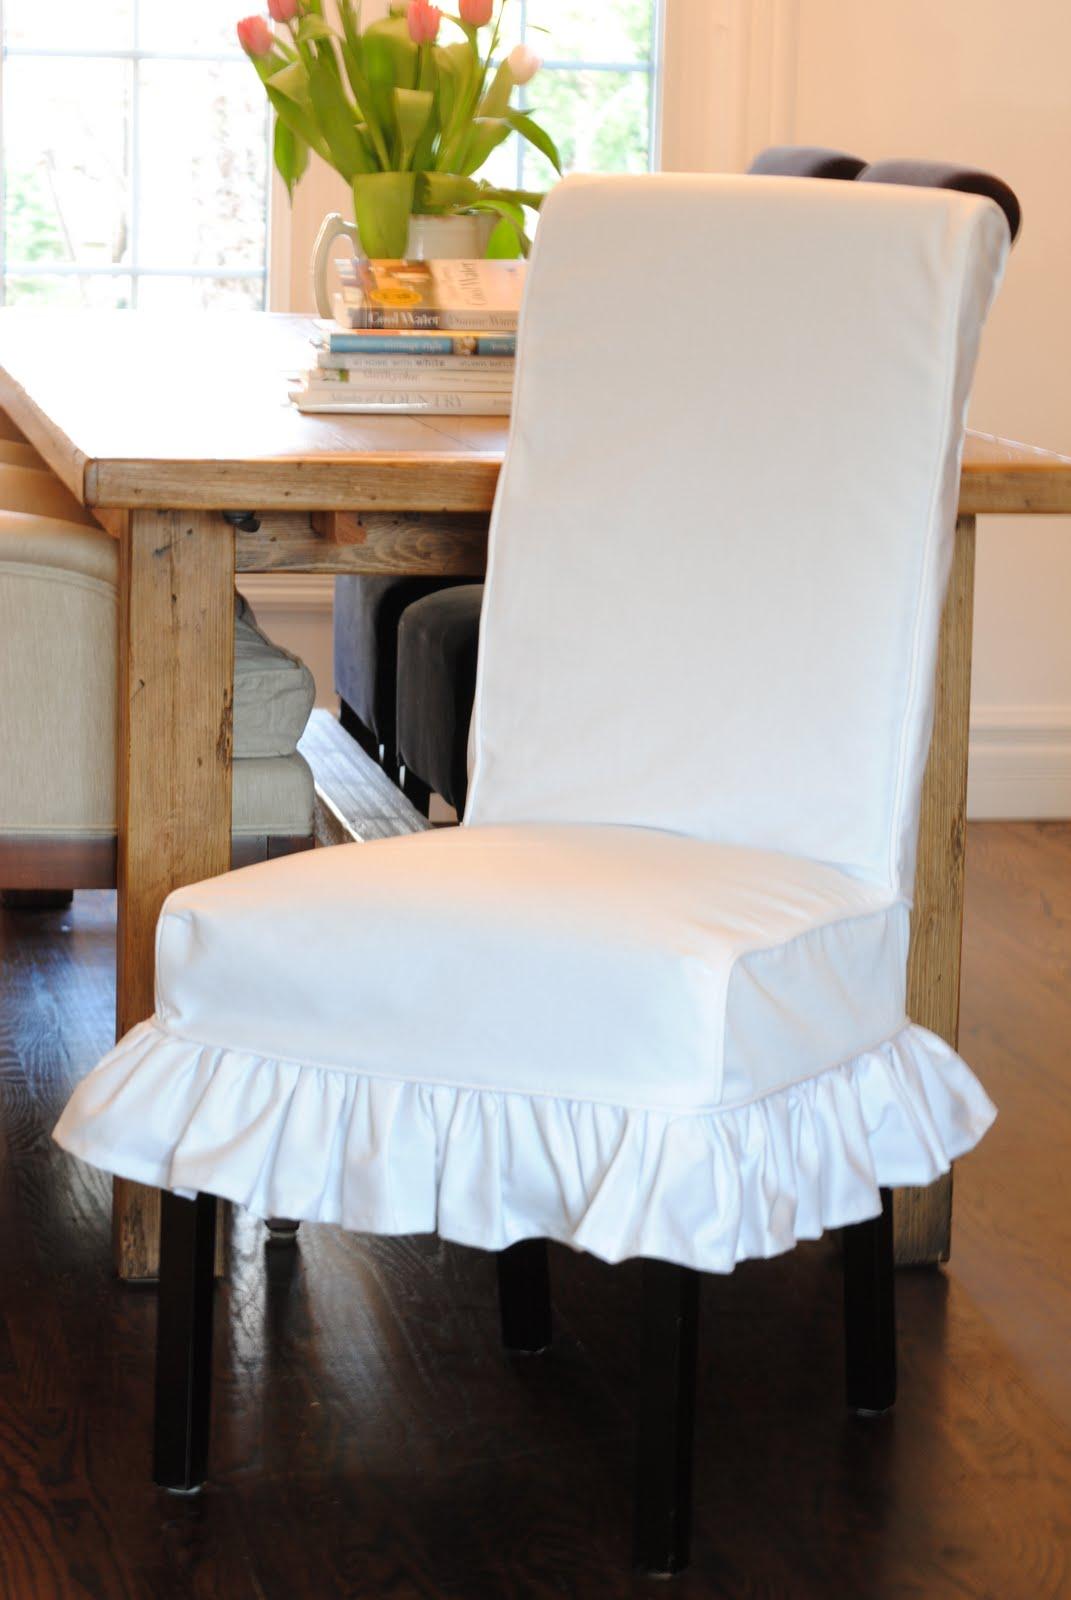 hang around chair cover steel lowest price razmataz shabby chic slip covers